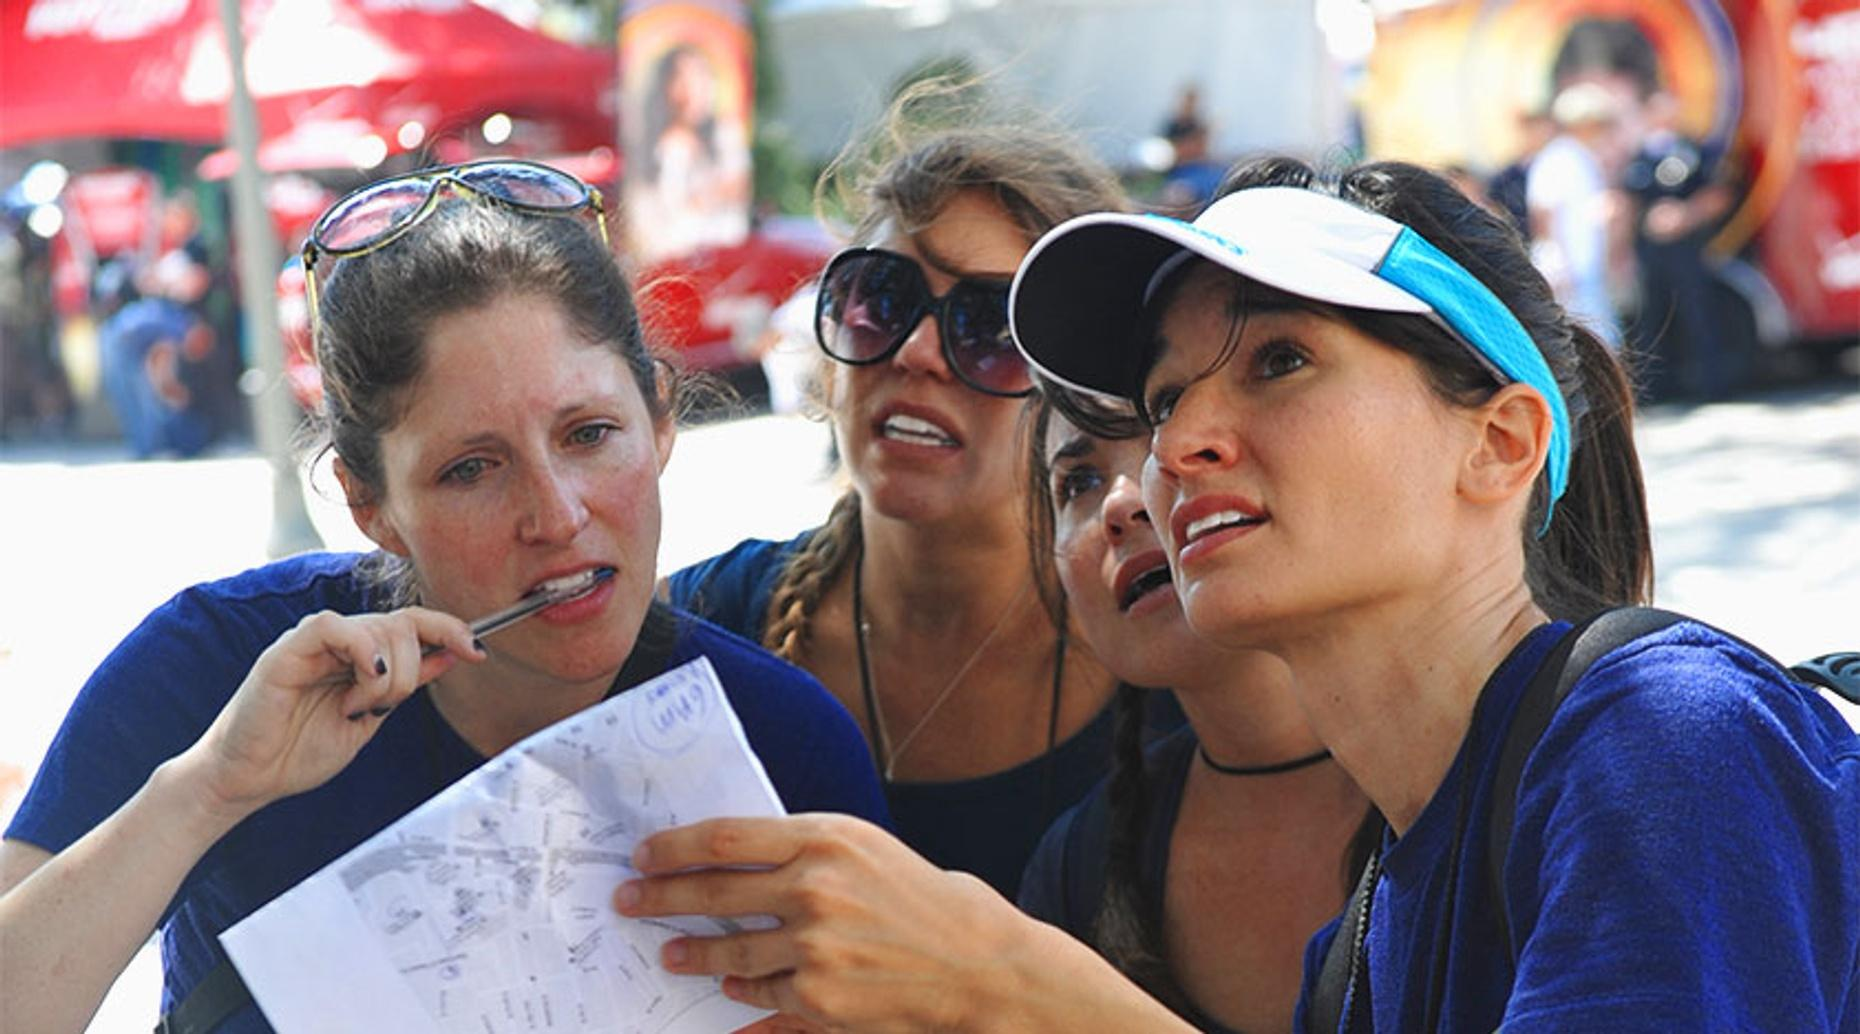 Venice Beach Scavenger Hunt Race